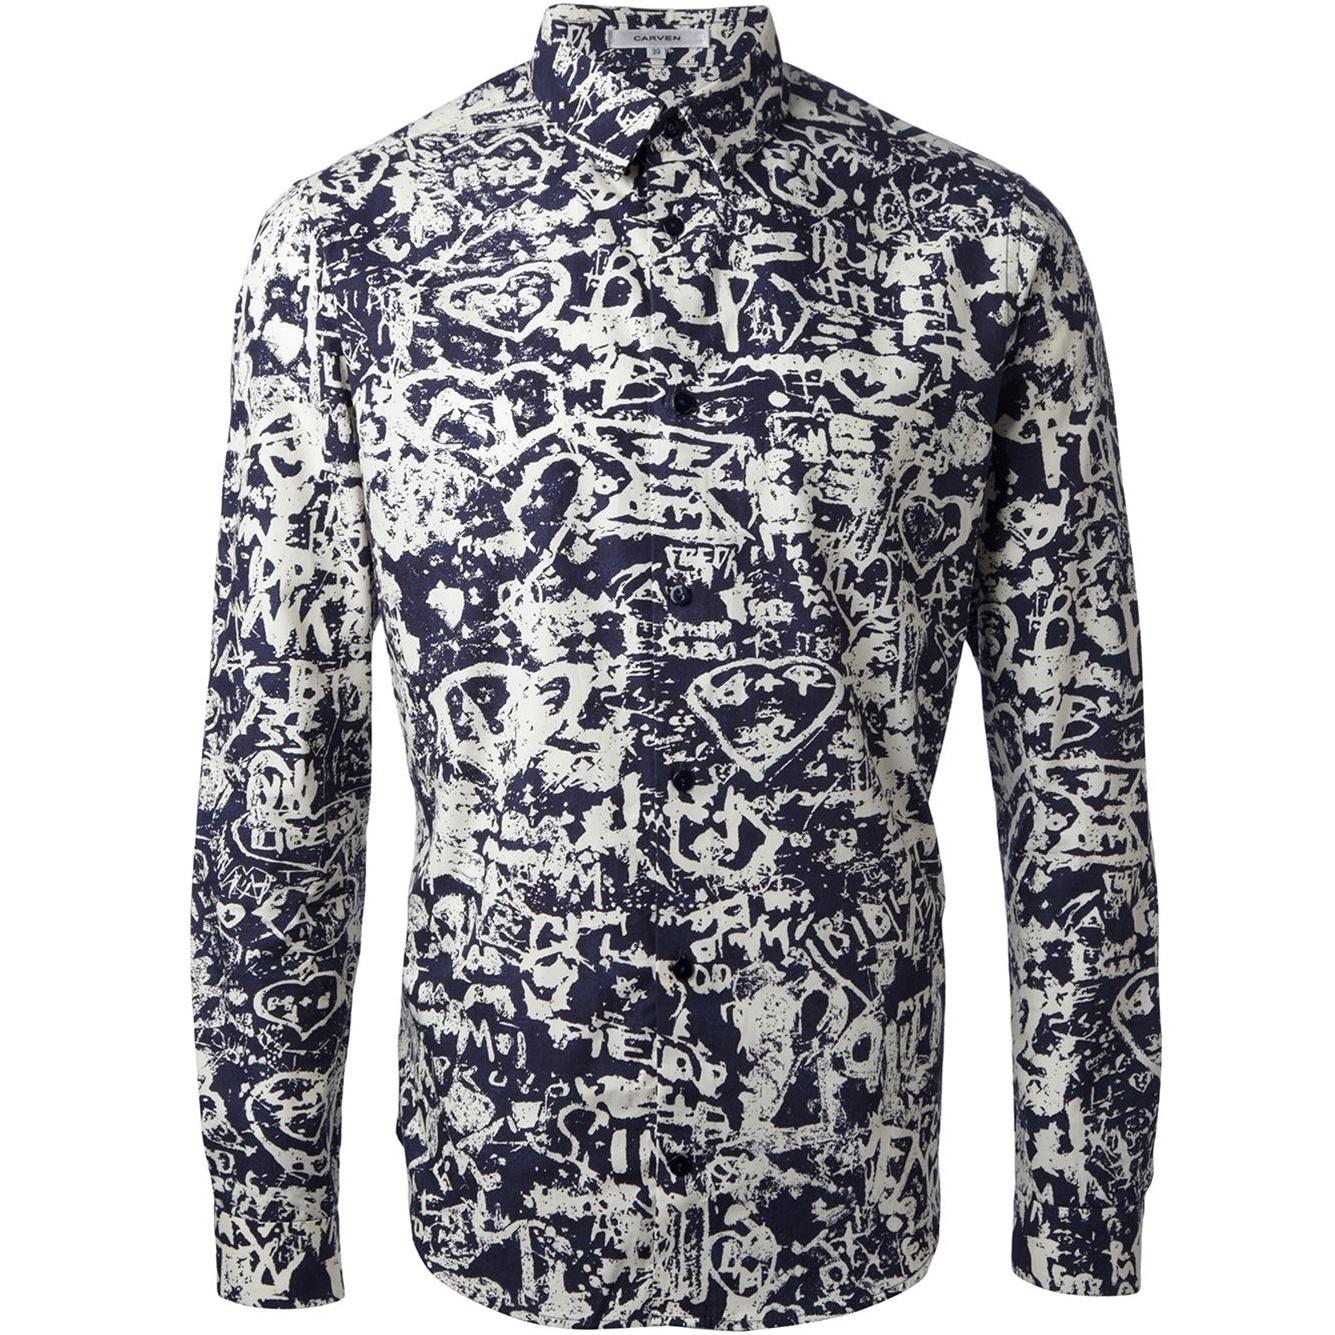 carven-blue-graffiti-print-shirt-product-1-22473397-2-071783960-normal.jpg